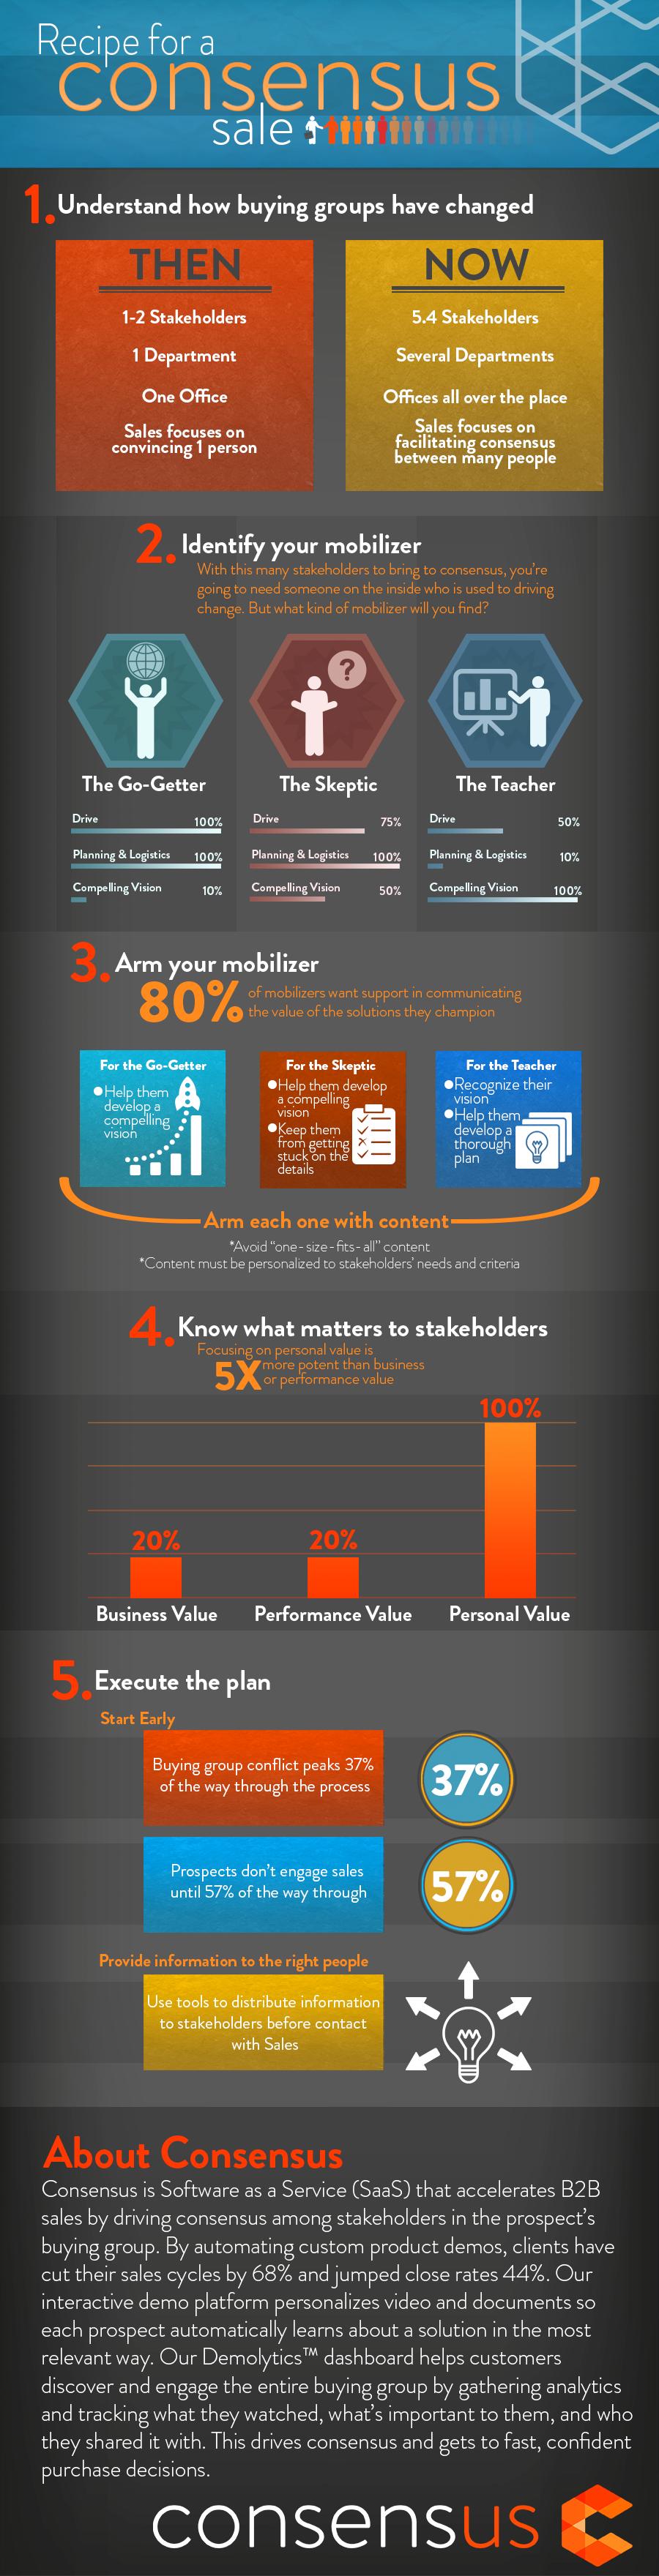 Infographic: Recipe for a Consensus Sale